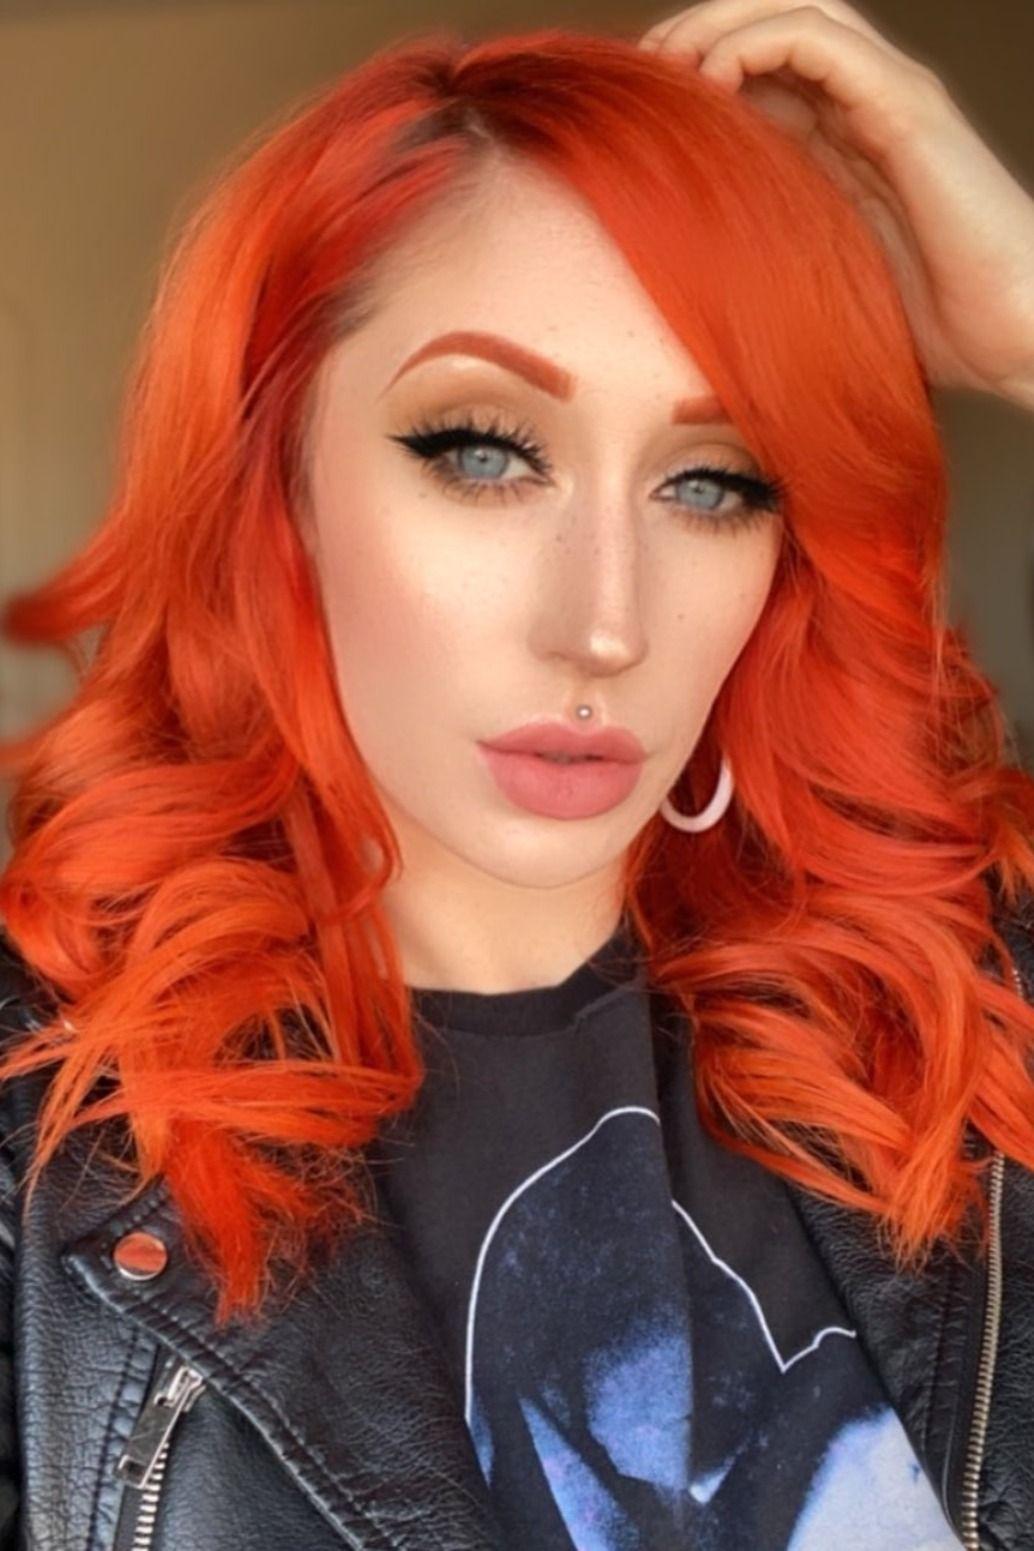 Sunset Orange In 2020 Short Red Hair Fox Hair Dye Brown Hair Dye